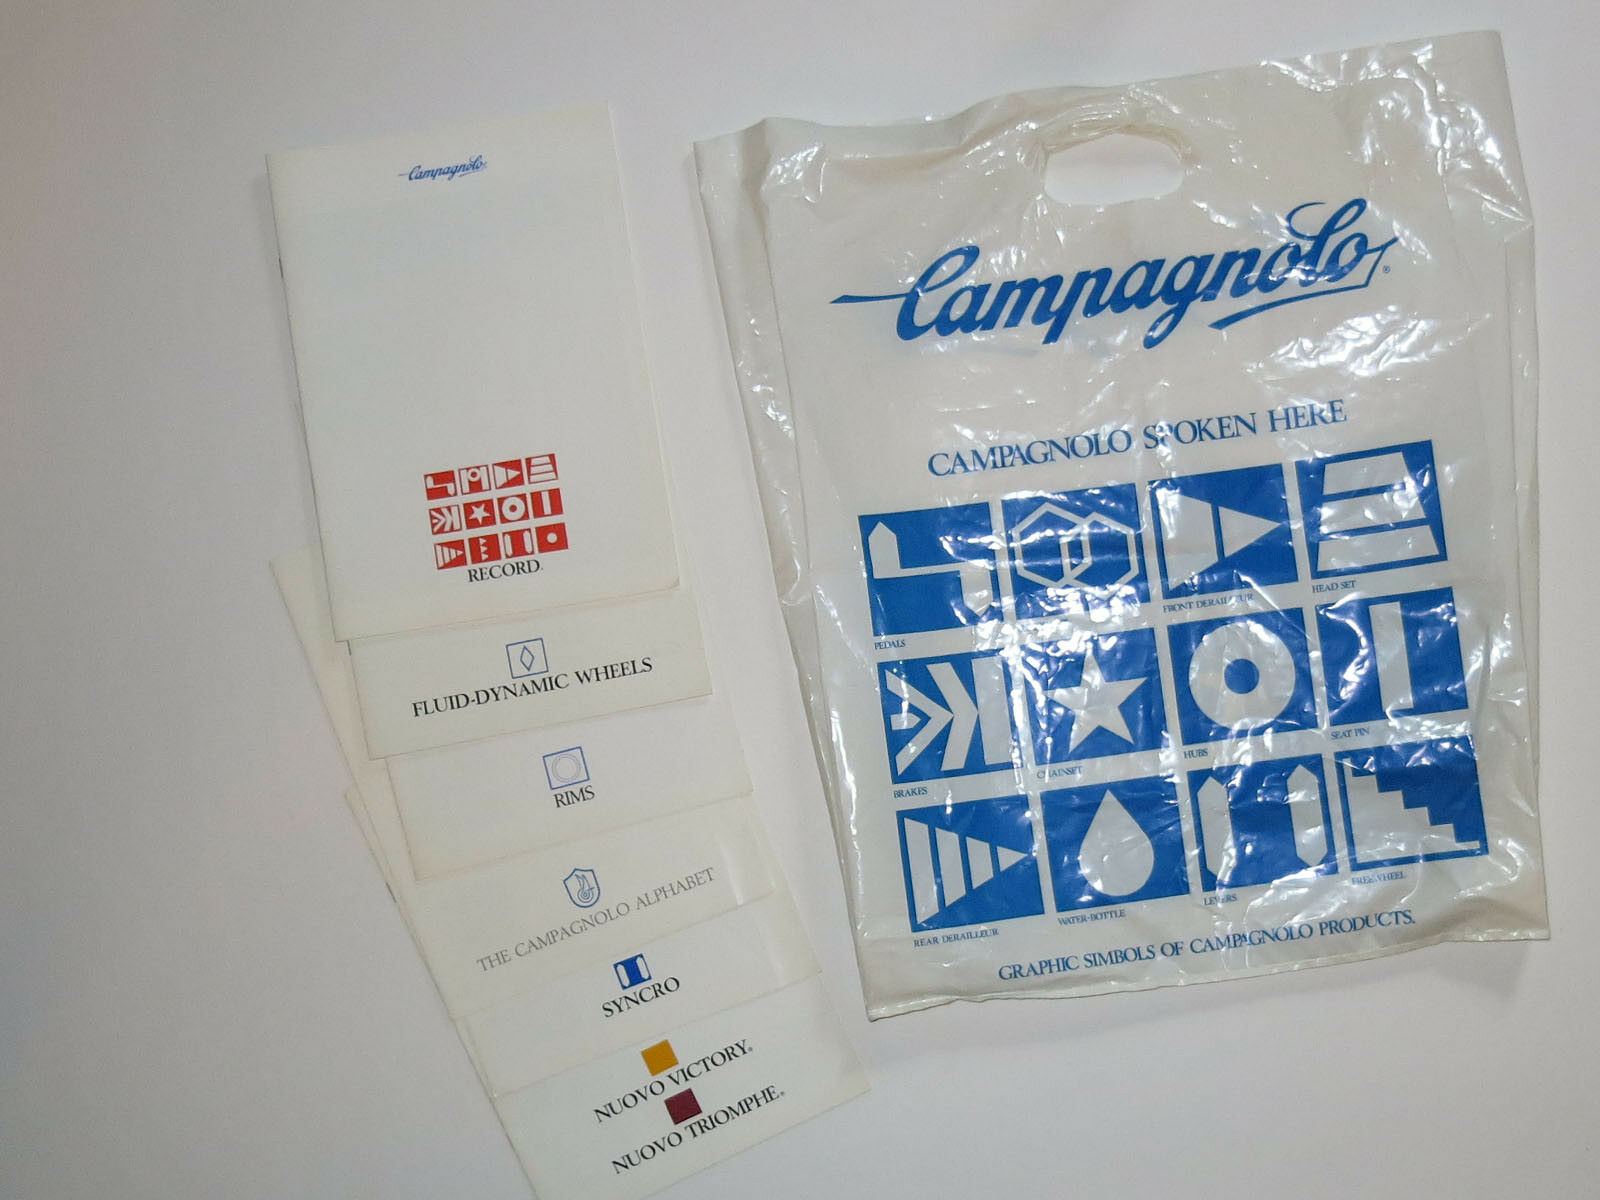 Campagnolo Record Era Trade Show Swag Bag with 6 Campagnolo catalogs